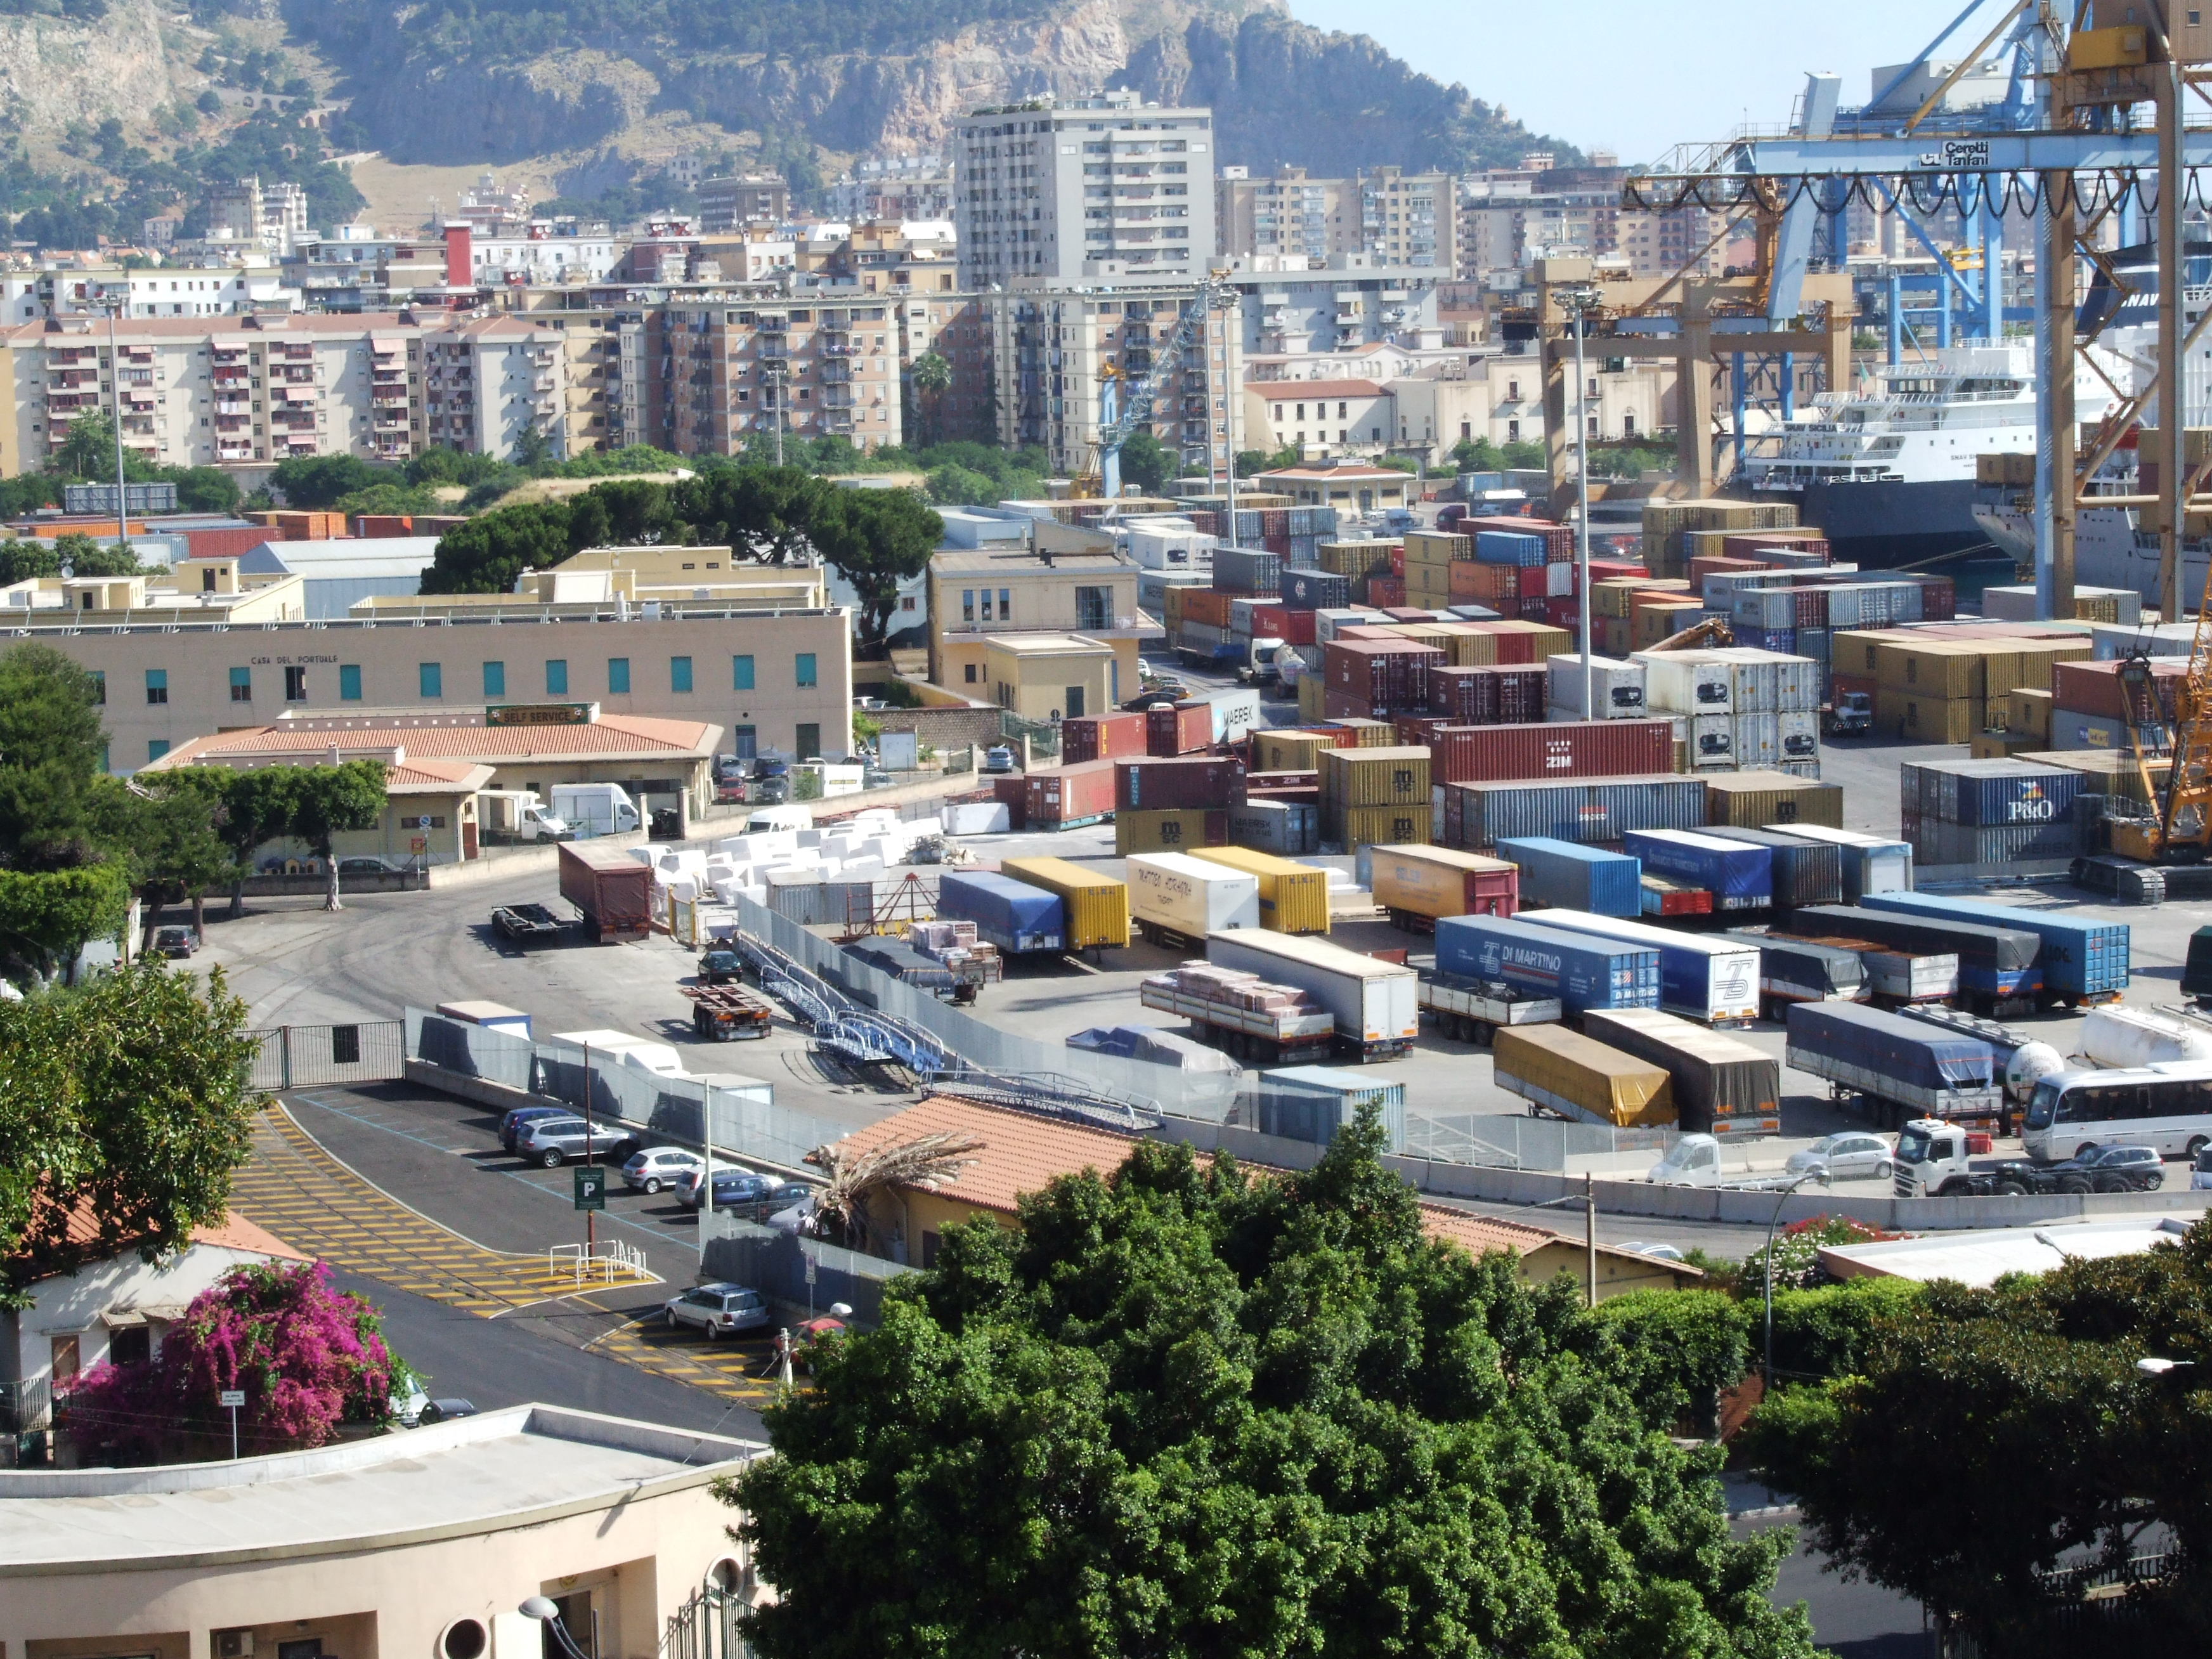 Palermo-sicilia italy italia - creative commons by gnuckx photo